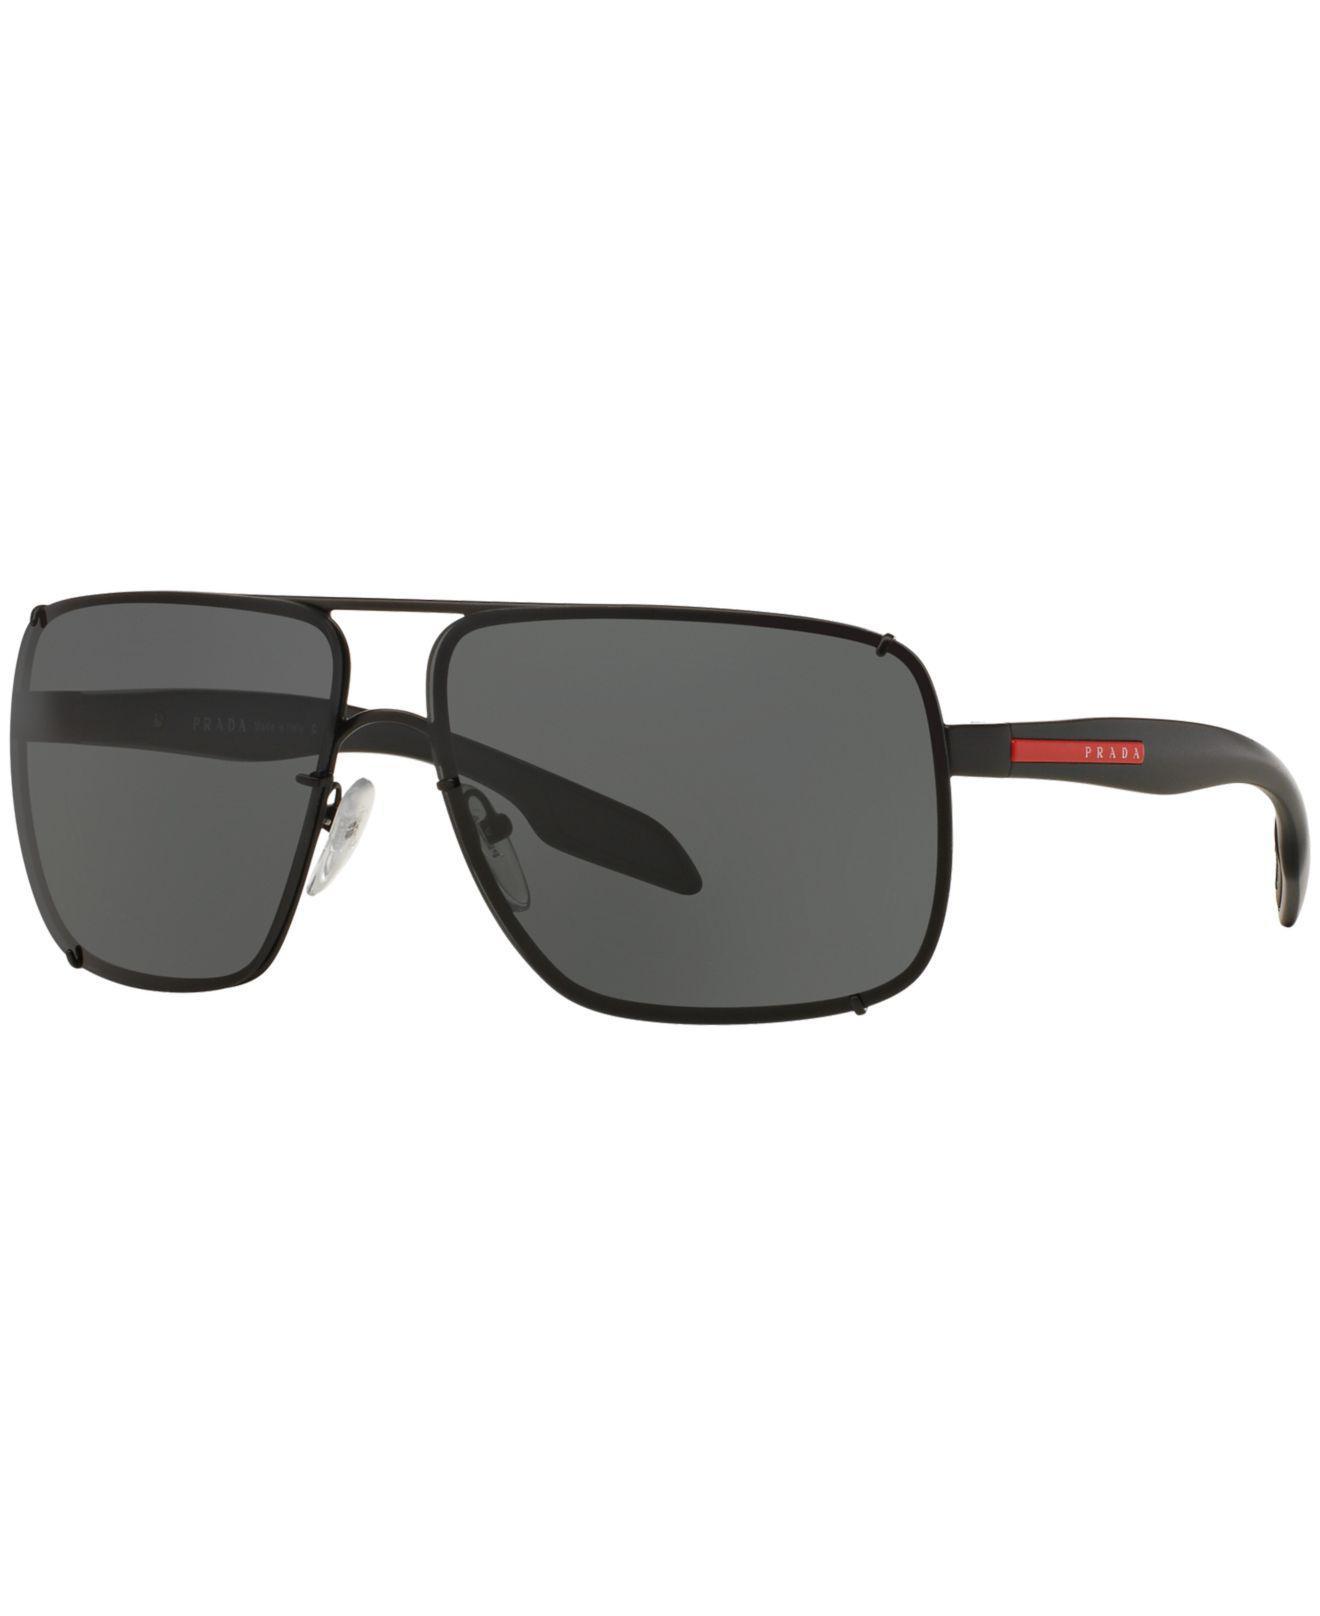 20cad845b8 Lyst - Prada Sunglasses